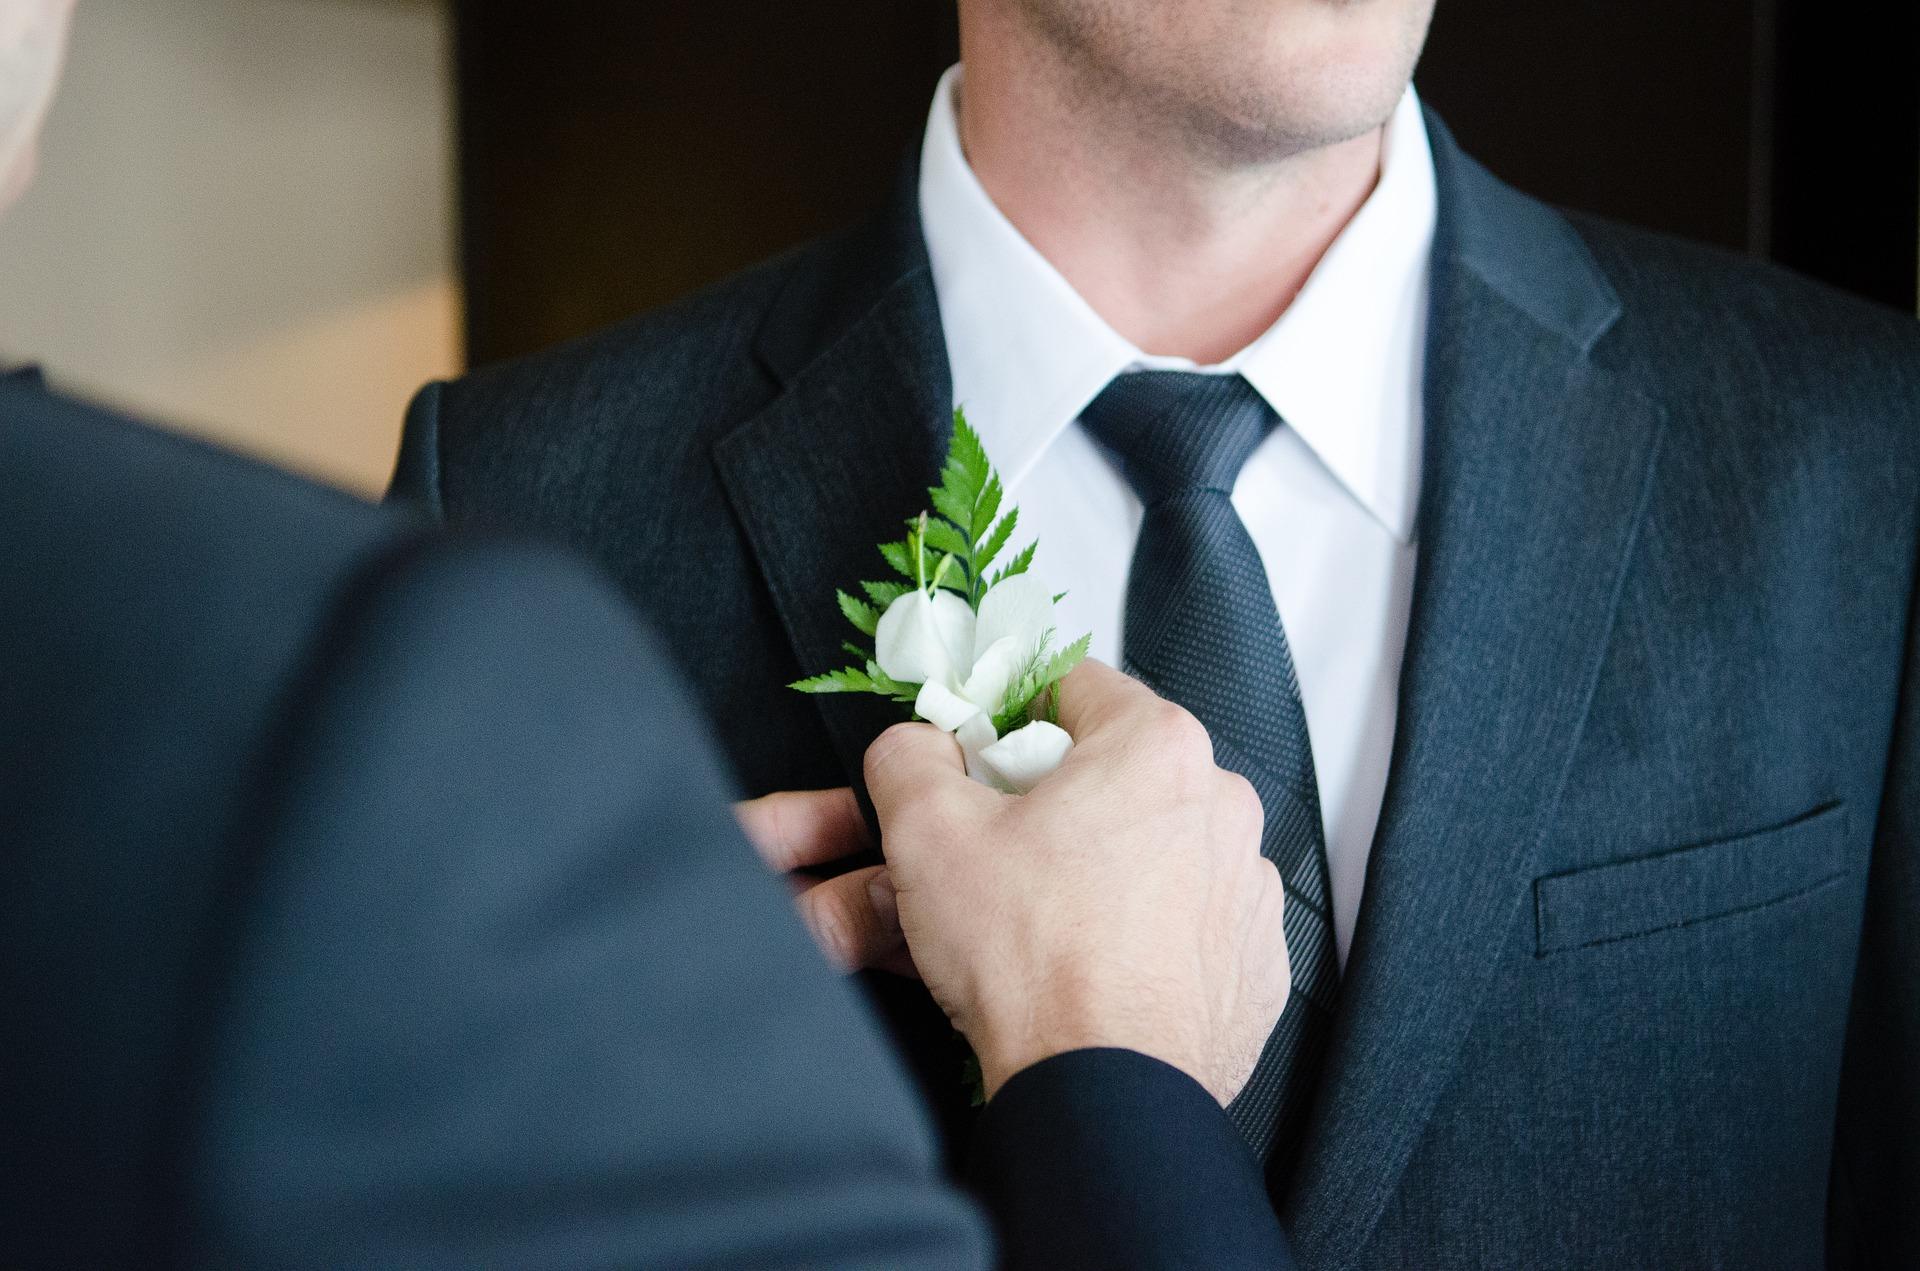 Men's Attire for a Winter Wedding